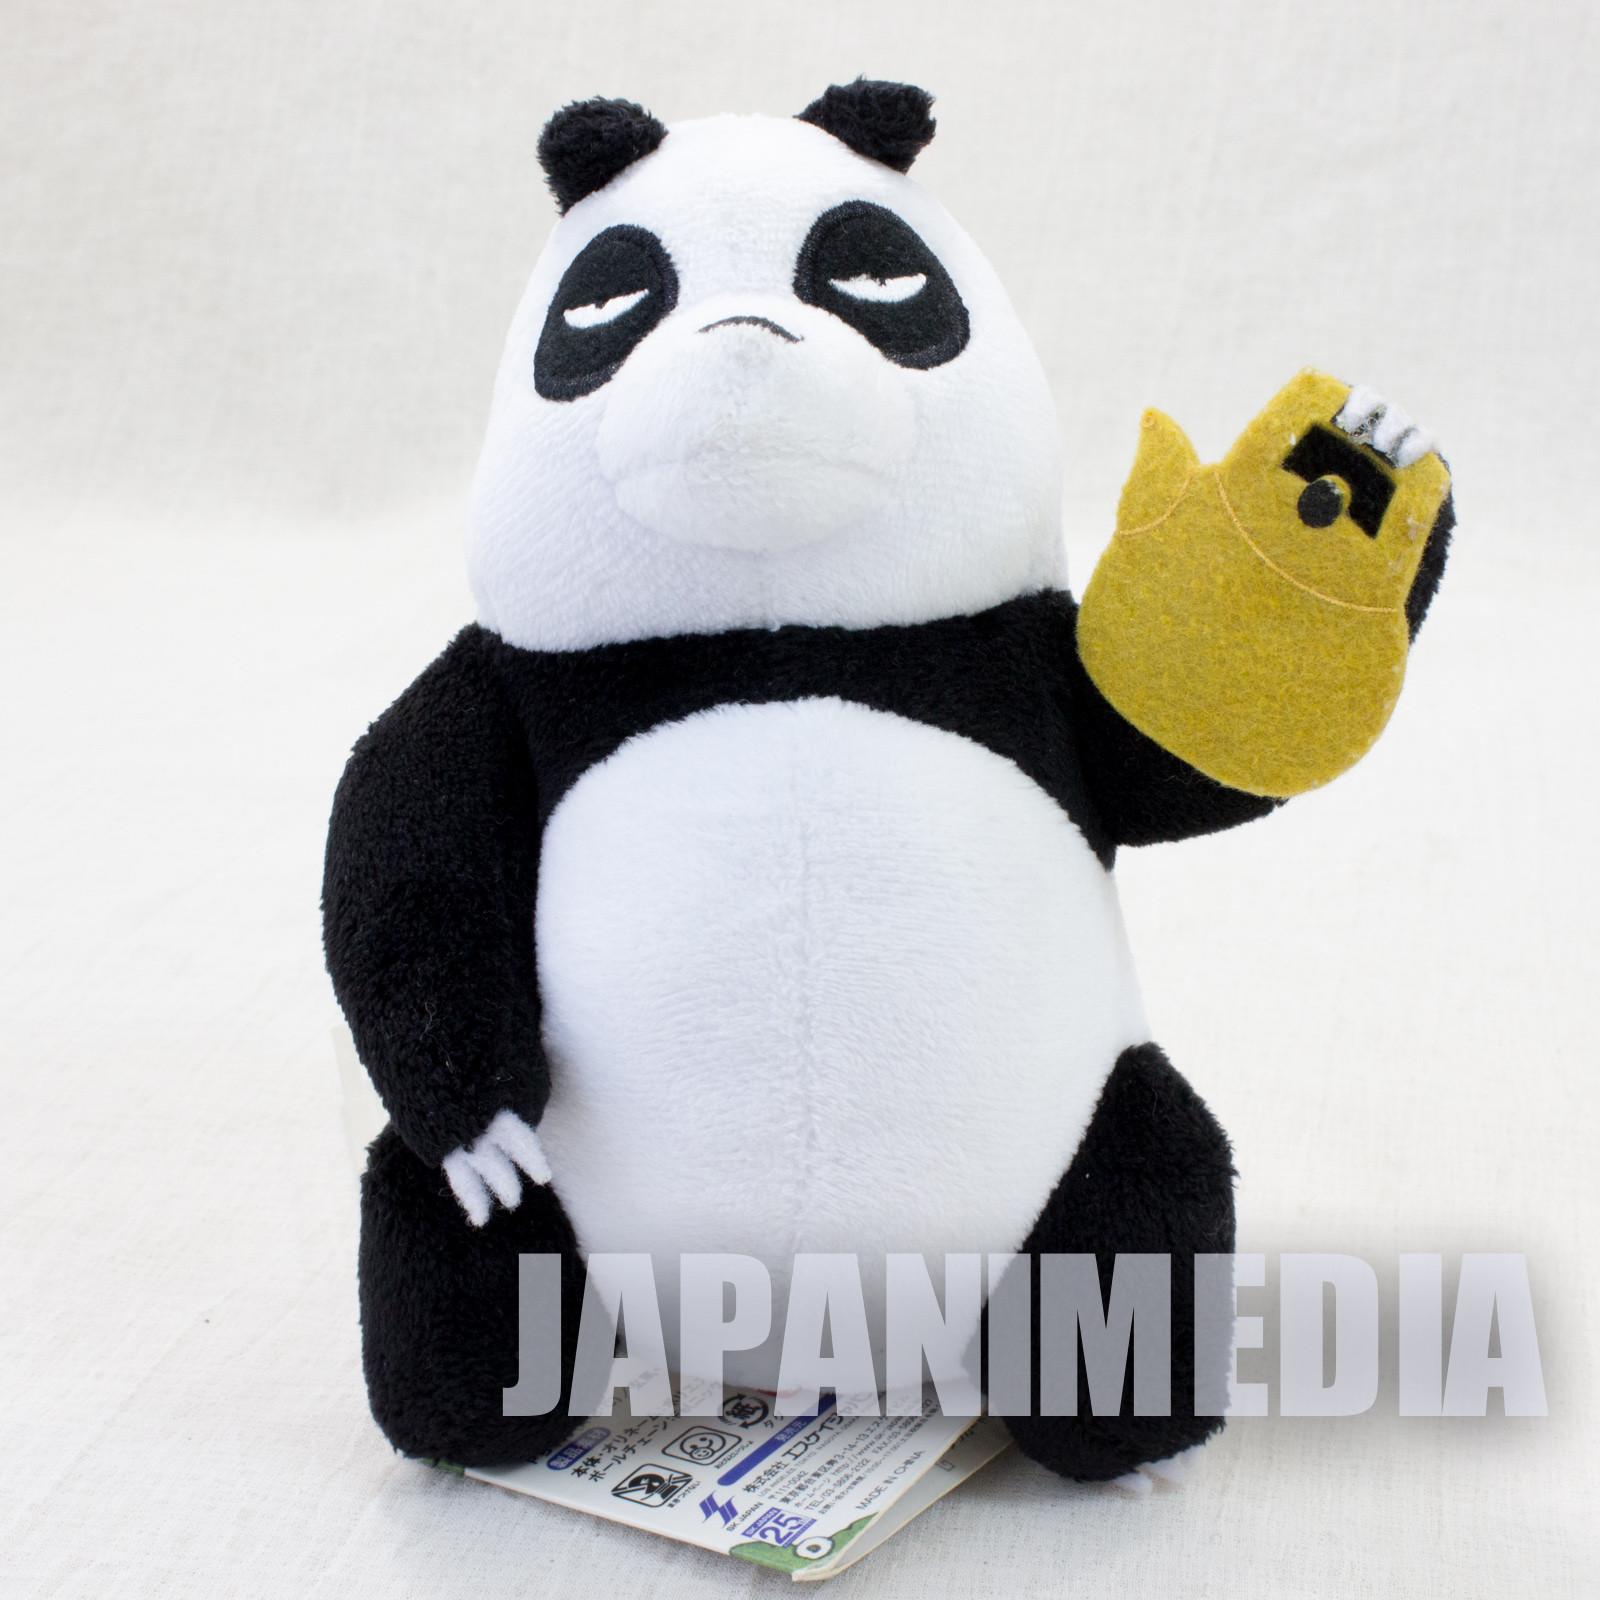 "Ranma 1/2 Genma Panda 6"" Plush Doll SK JAPAN ANIME MANGA 1"